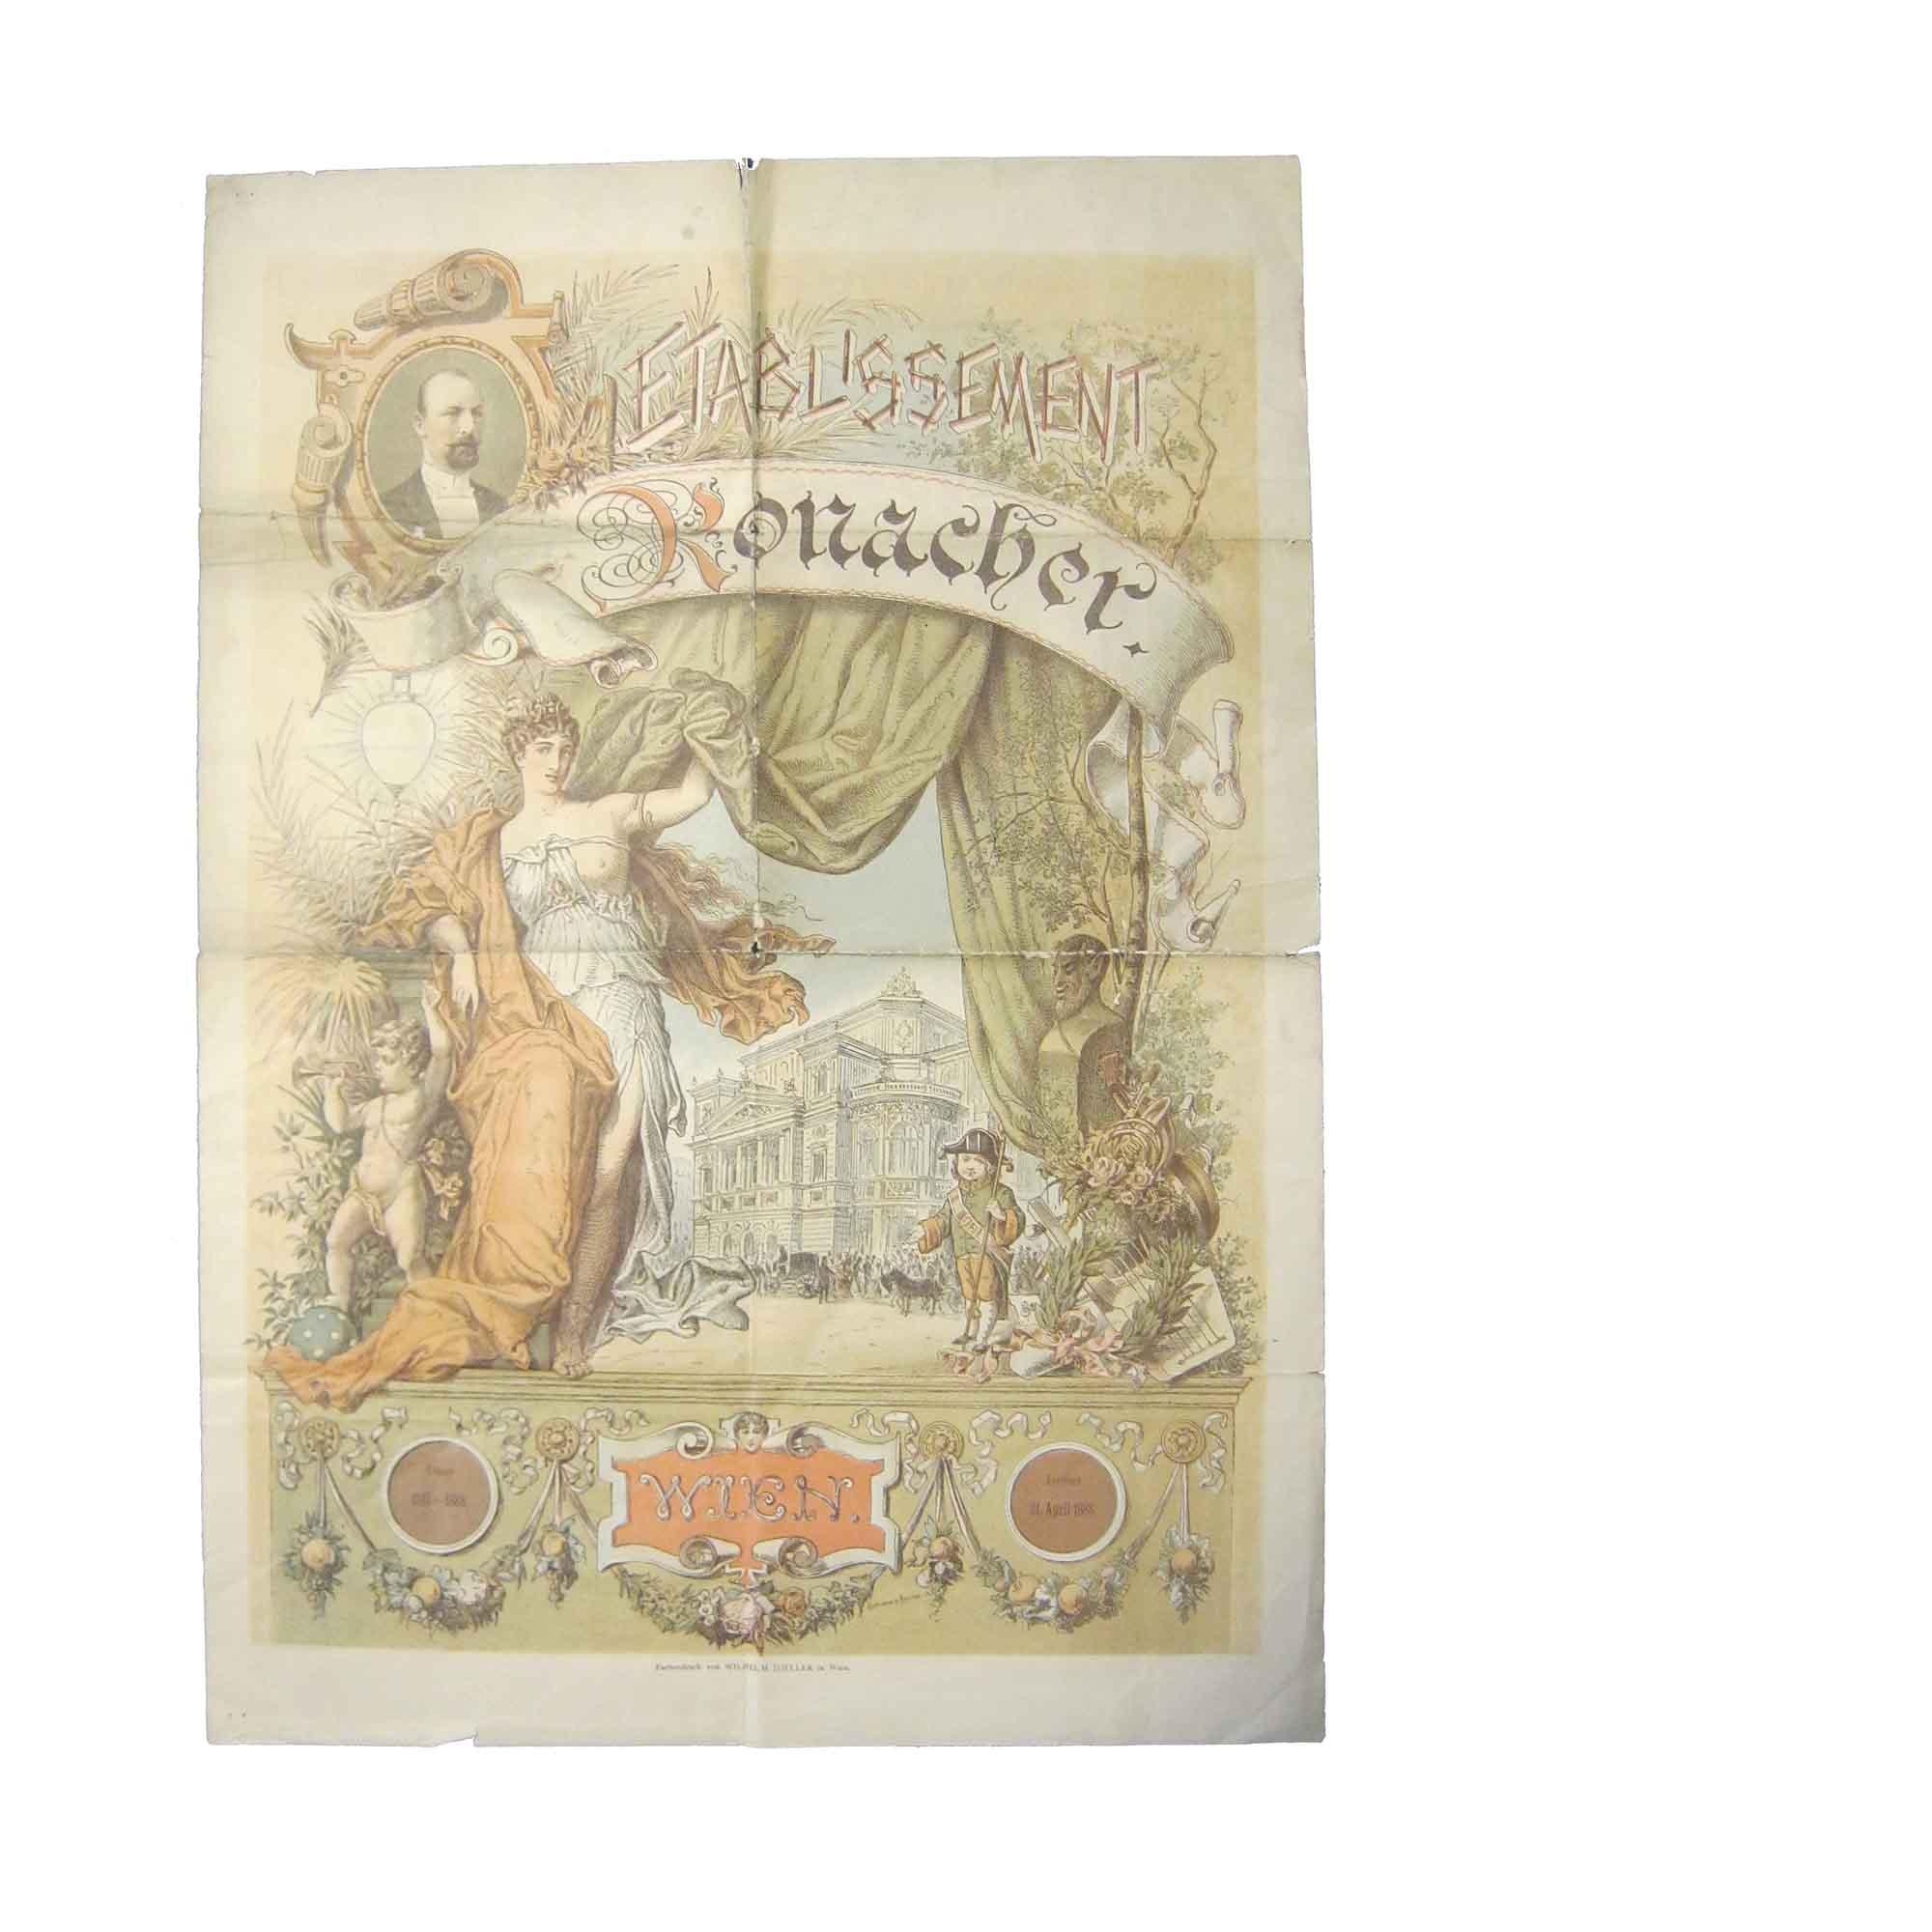 5458-Ronacher-Plakat-1888-r-N.jpg